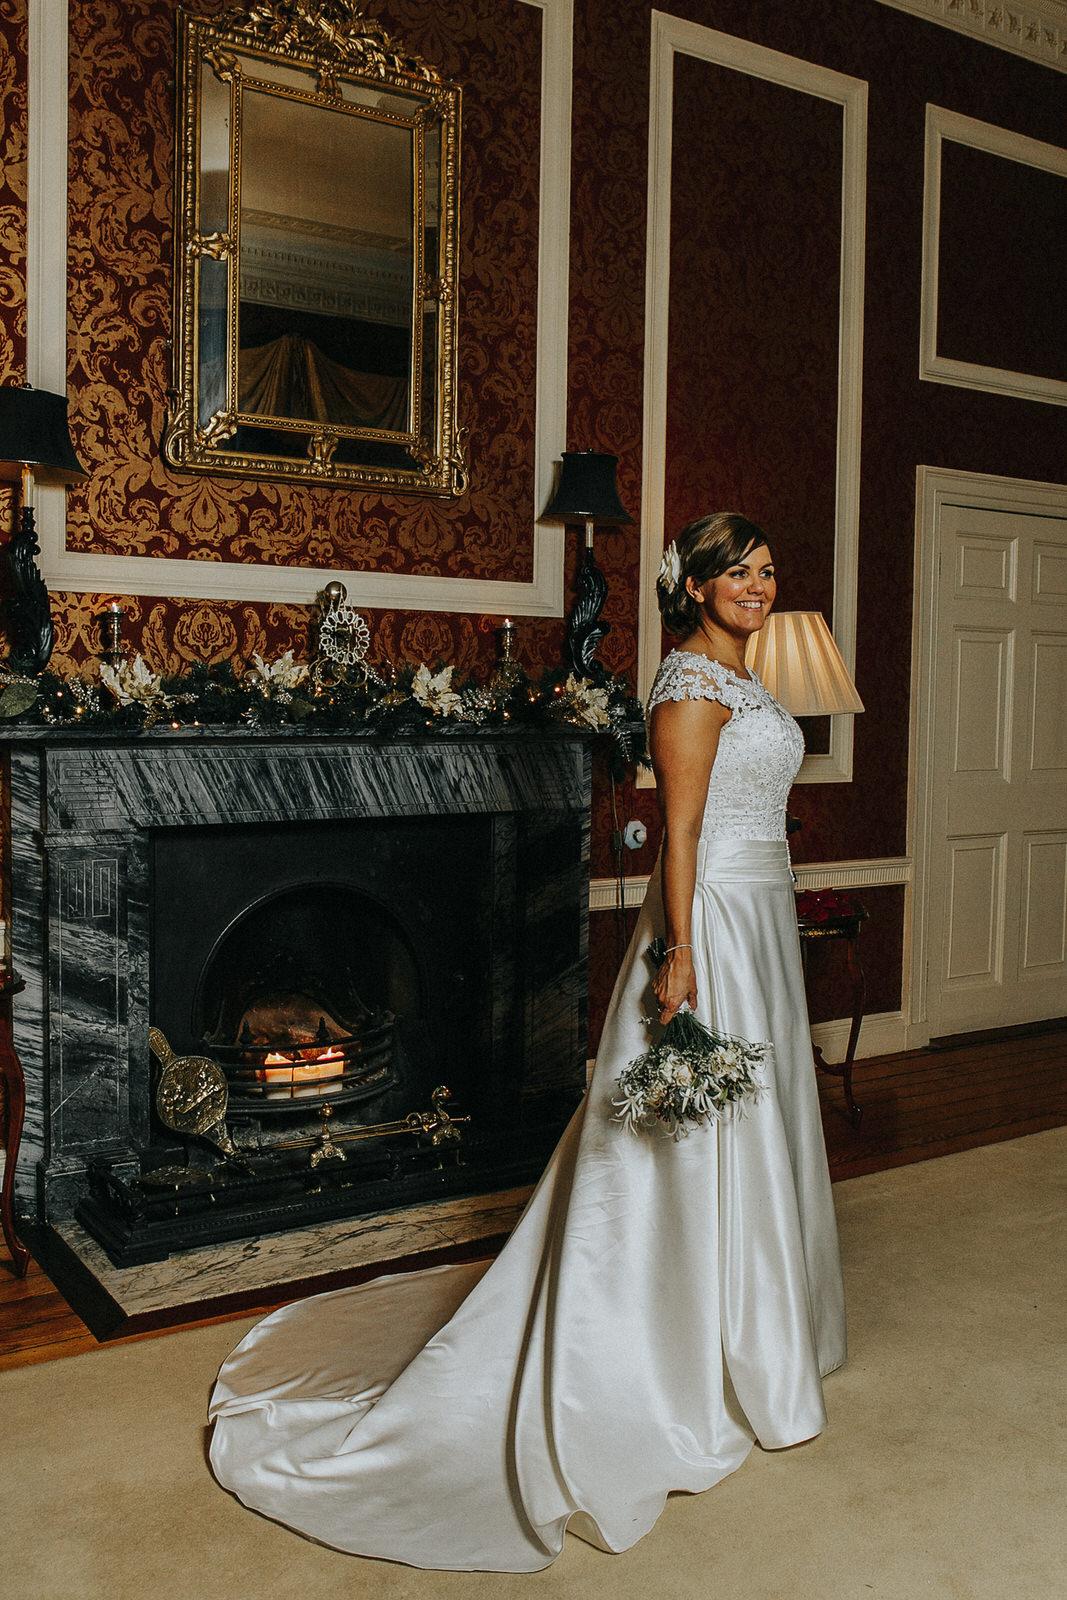 Roger_Kenny_wedding_photographer_Tankardstown_630.jpg